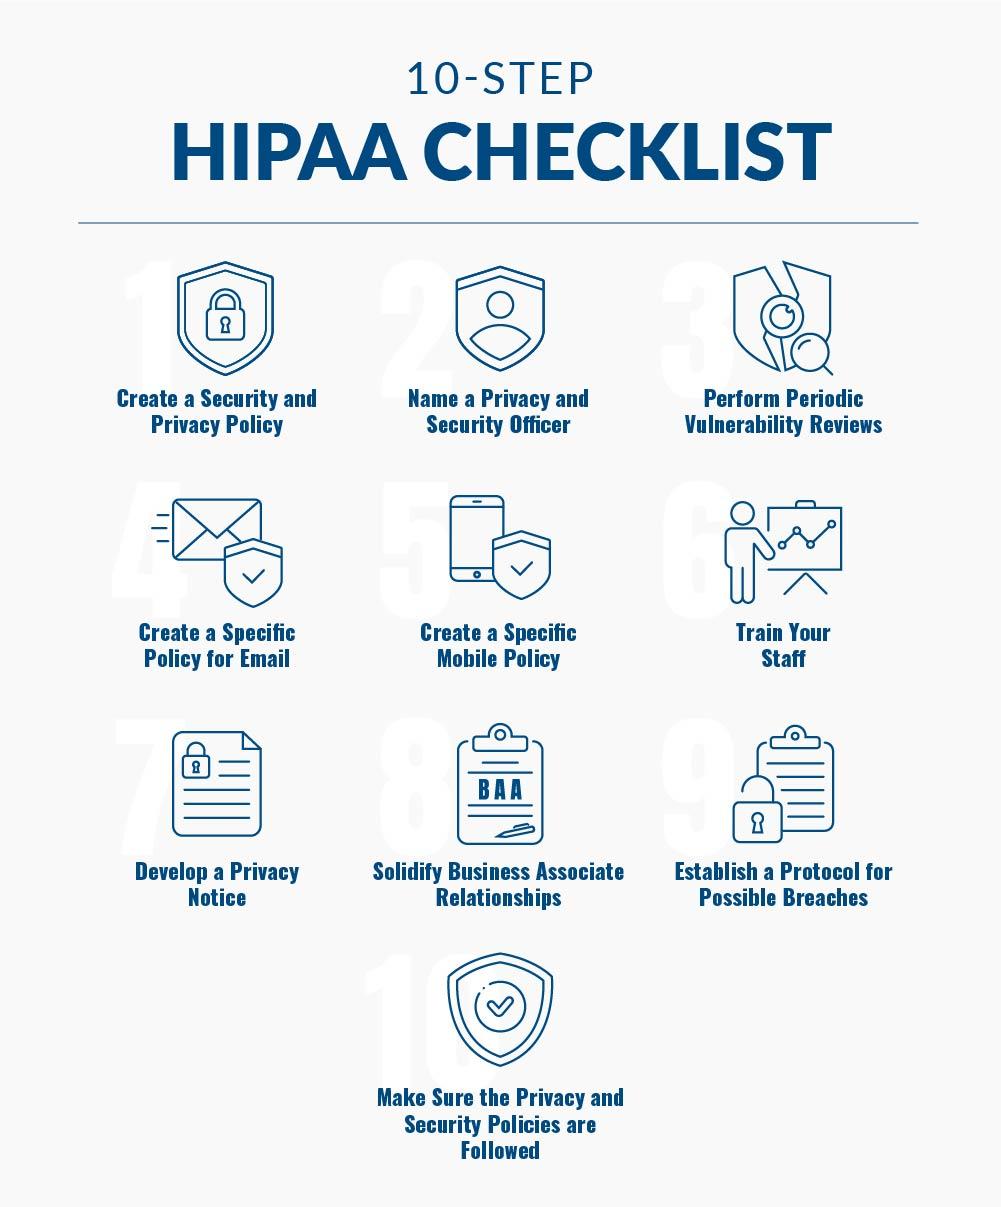 How to become HIPAA Compliant? 10 step HIPAA Checklist.